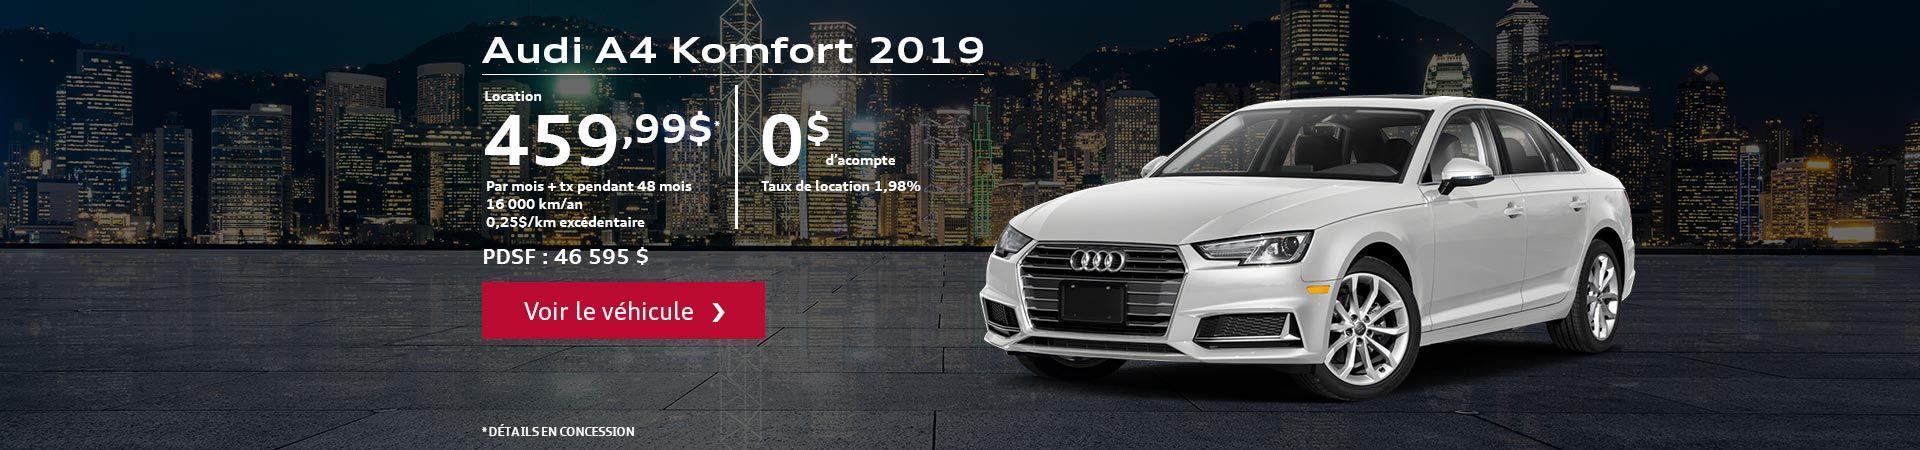 A4 komfort 2019